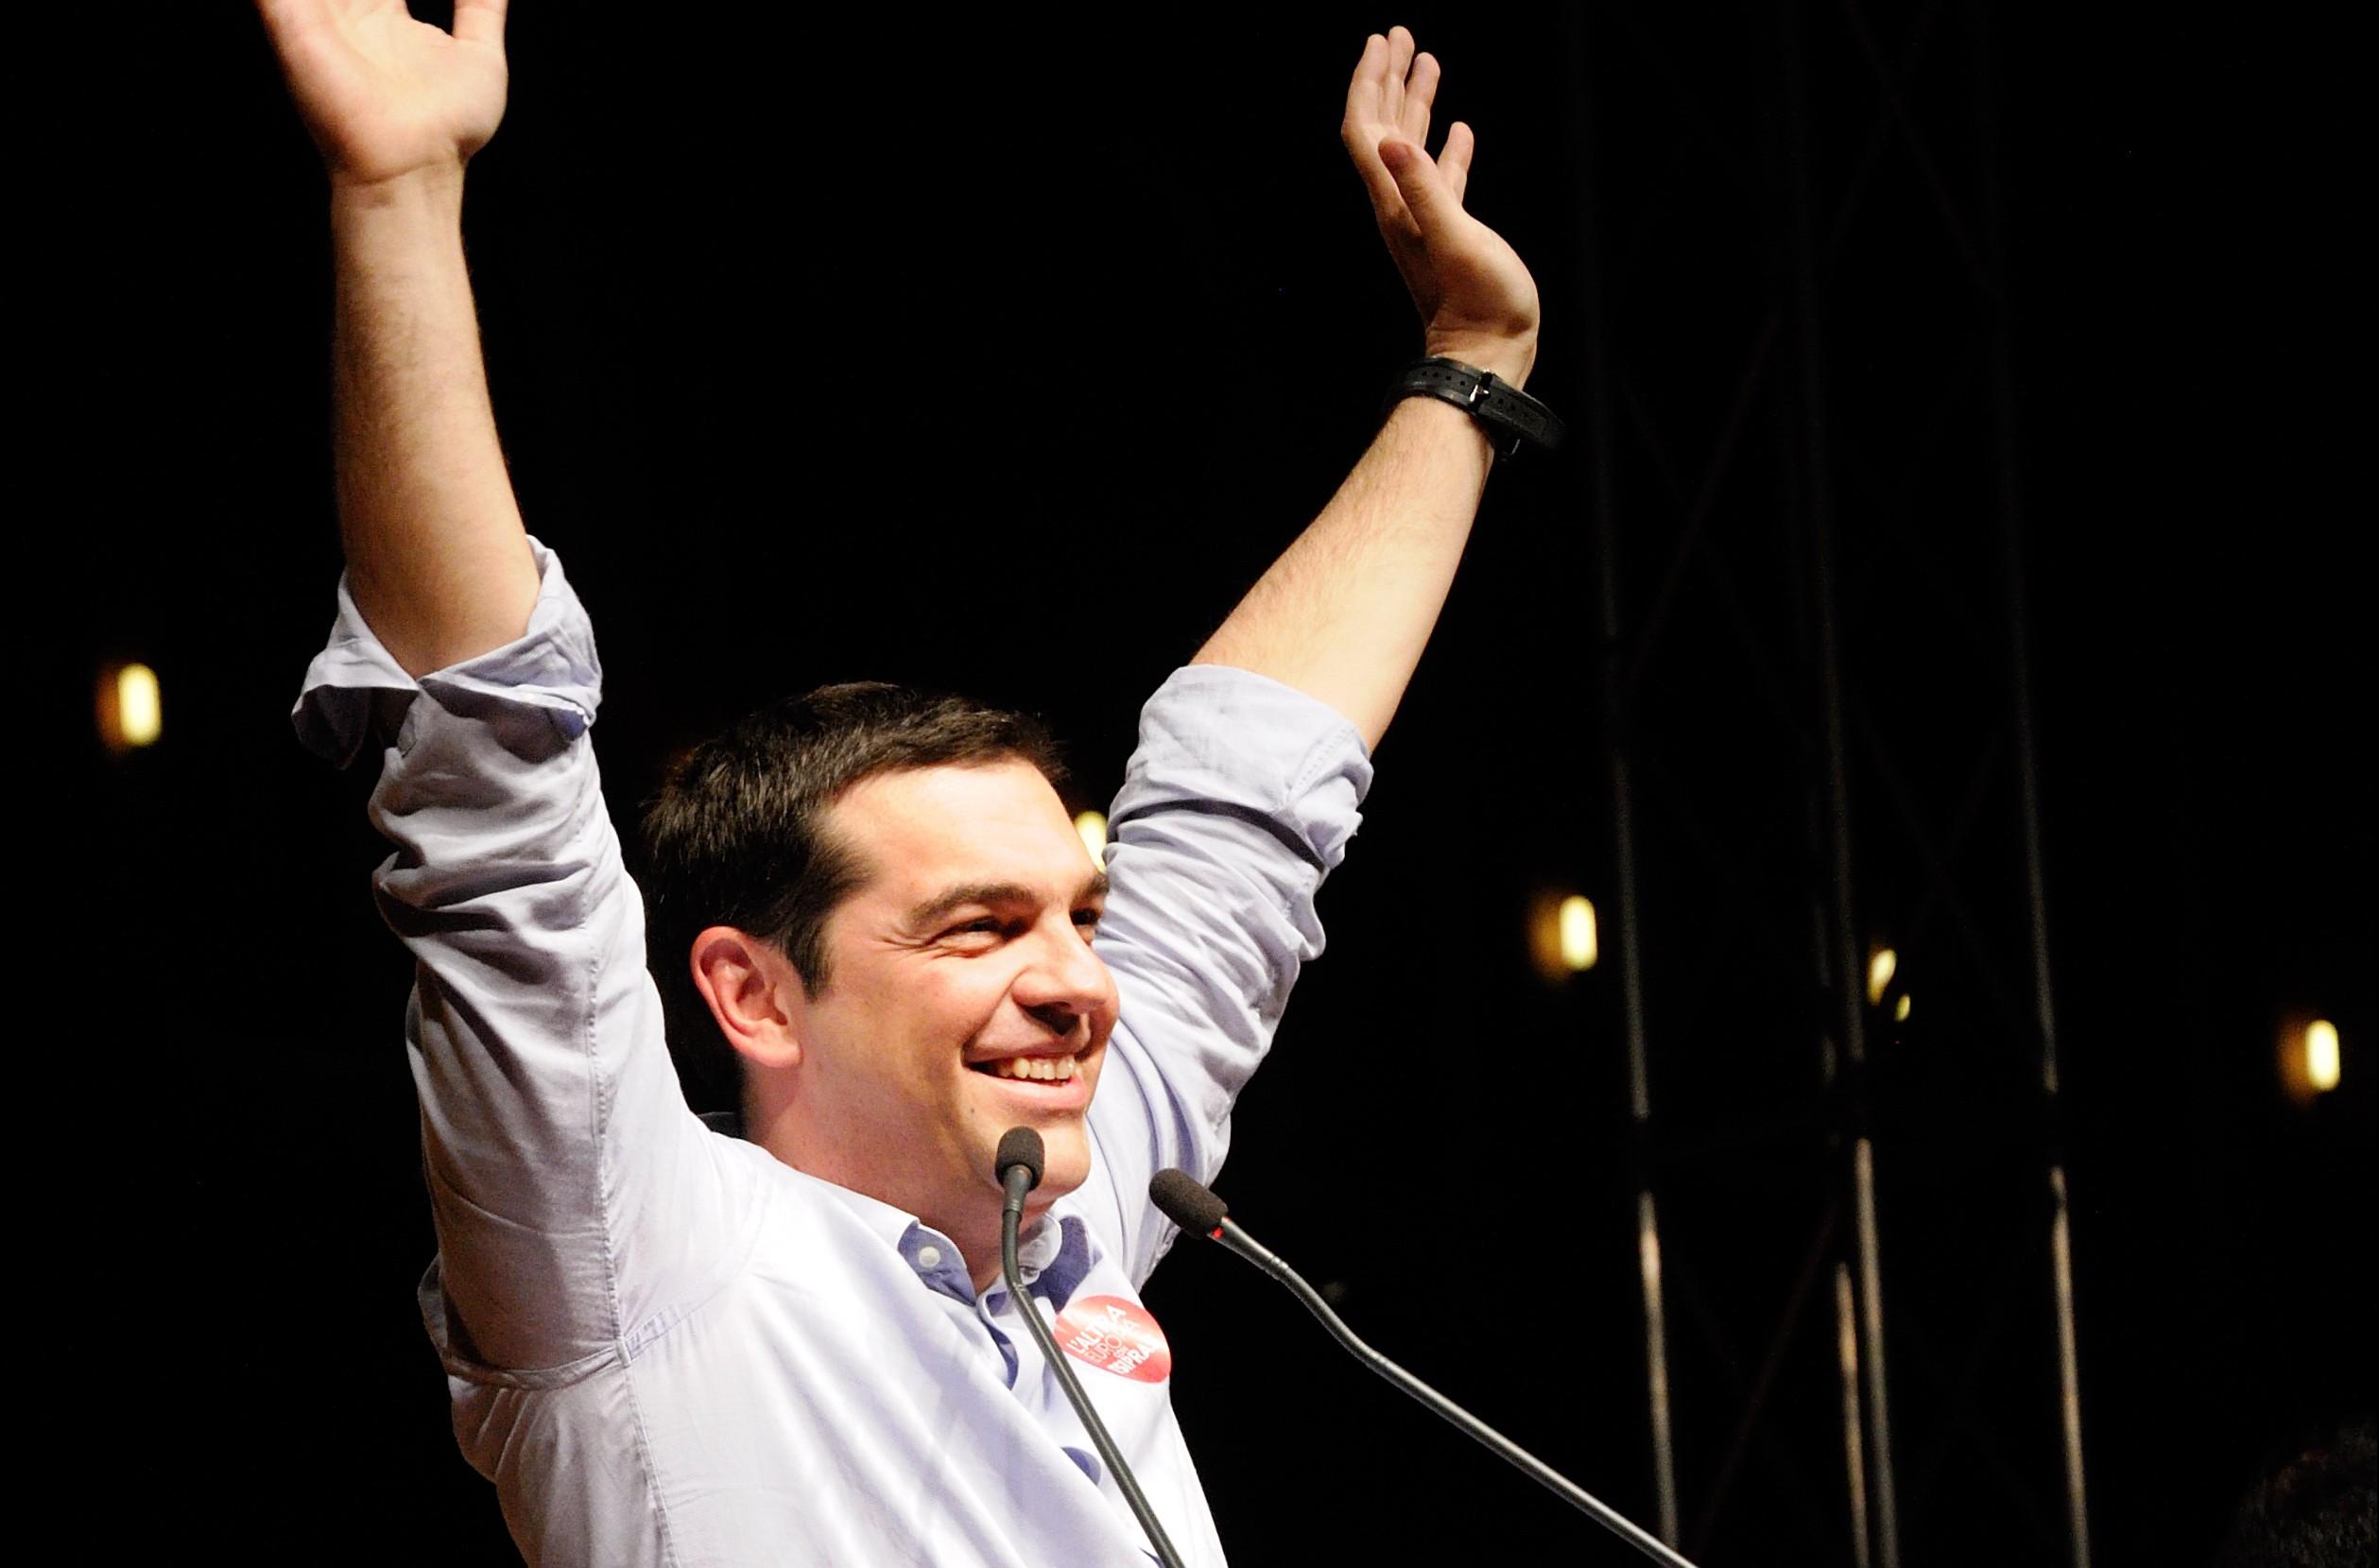 Tsipras. Photo: Lorenzo Gaudenzi, Flickr